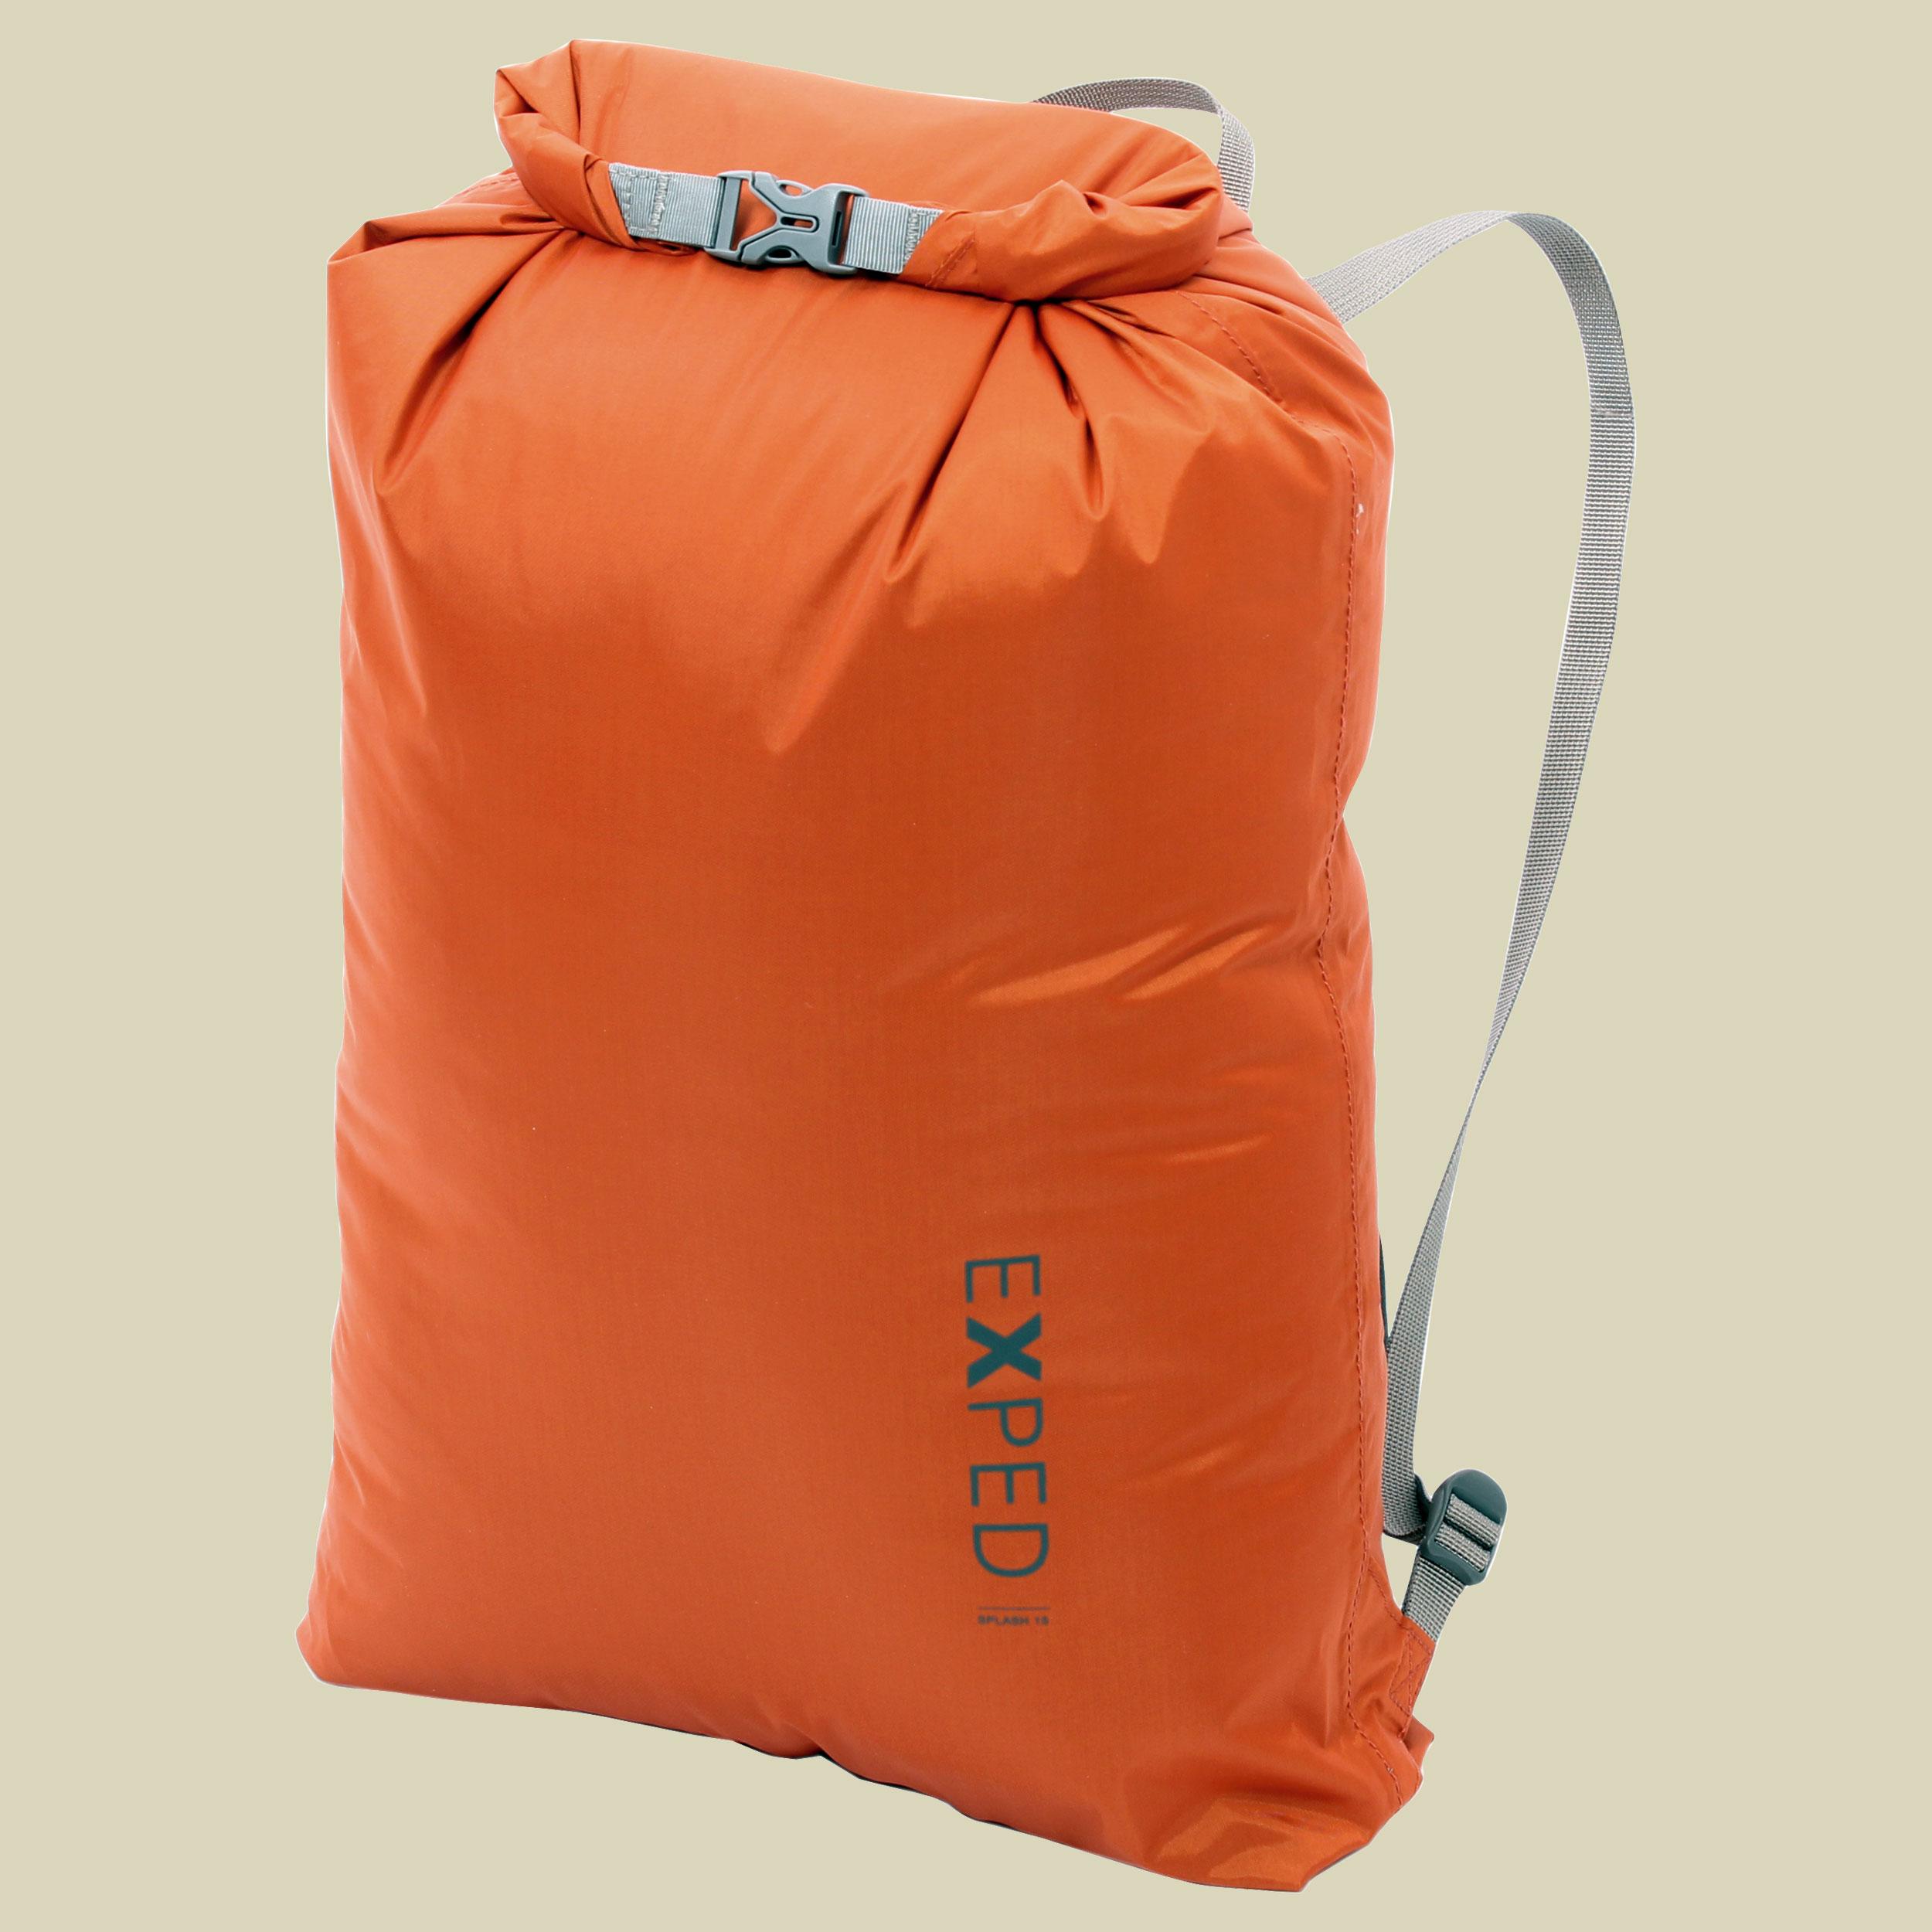 Image of Exped Splash 15 Packsack/Drypack Volumen 15 L terracotta